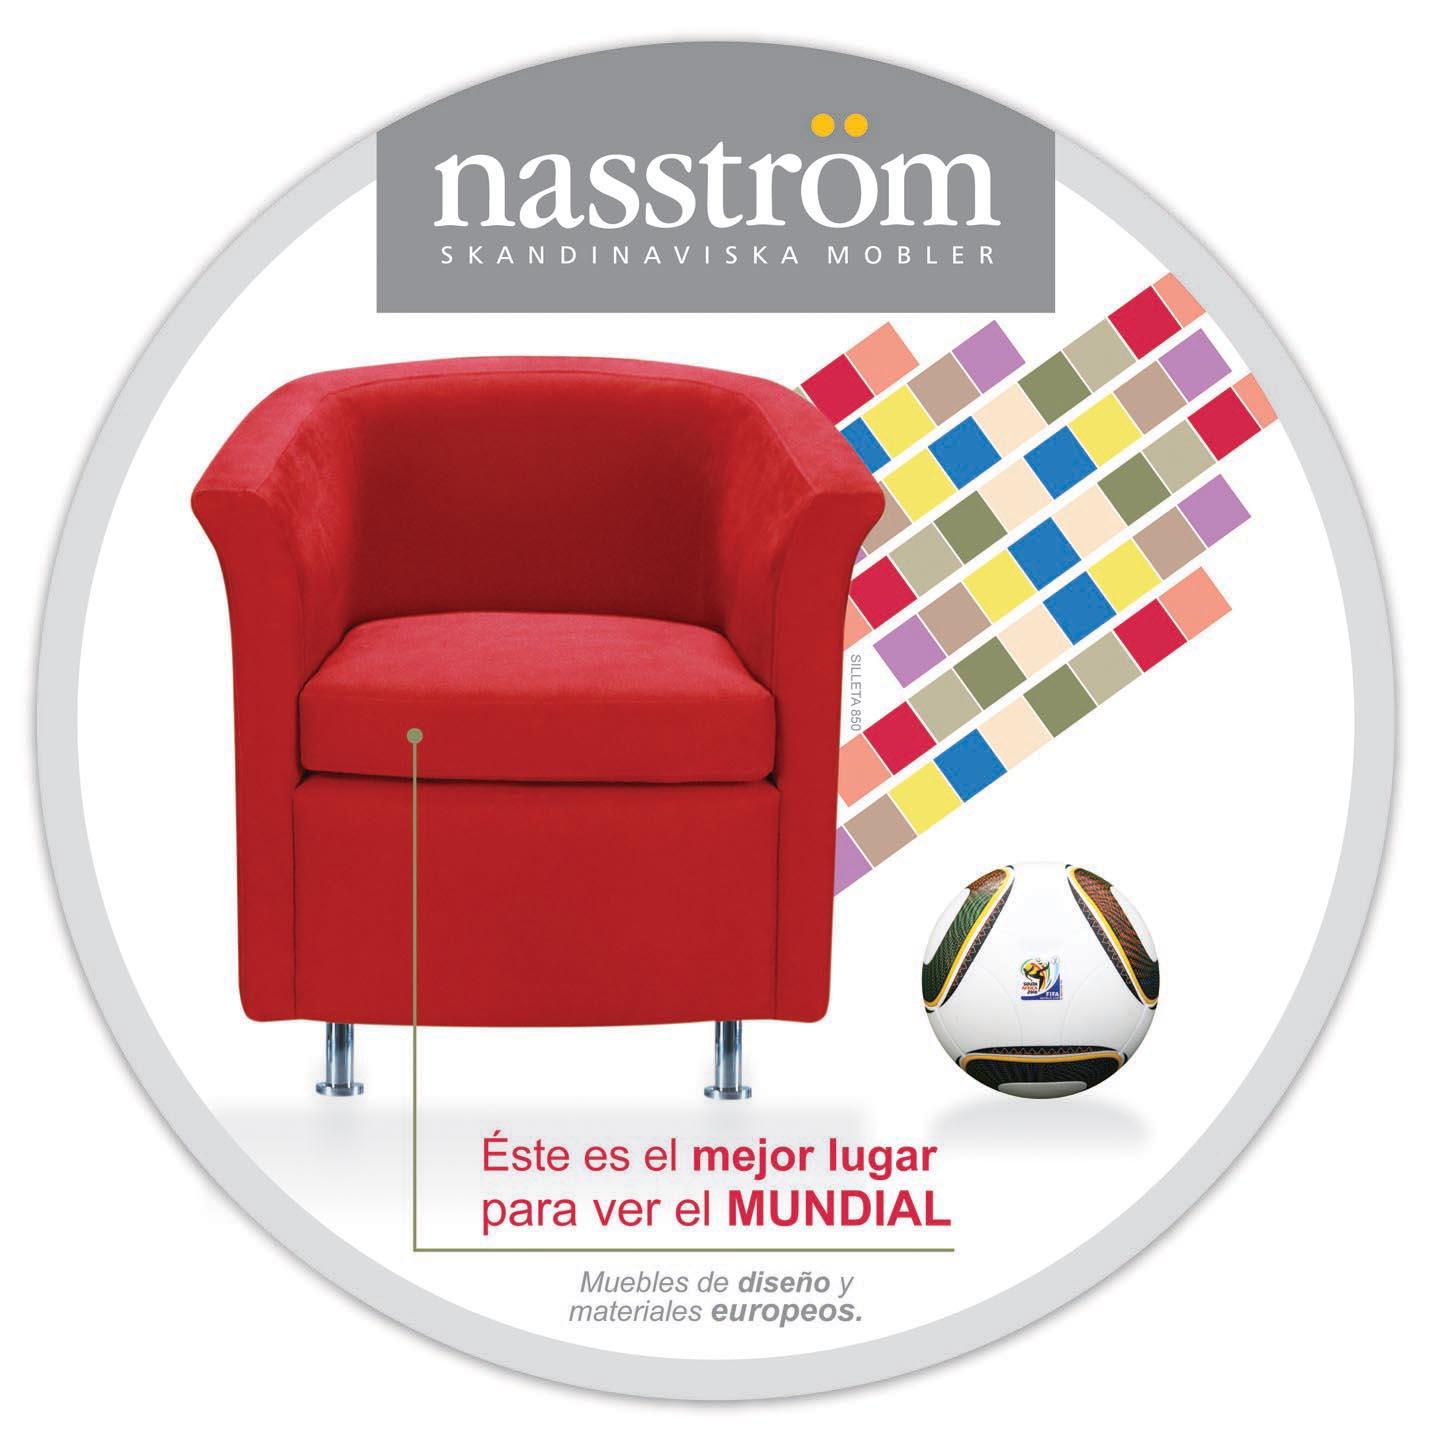 Muebles Nasstrom - Muebleria Nasstrom Com Mx Merida Directorio De Empresas Y Servicios[mjhdah]https://cdn.shopify.com/s/files/1/1481/8354/products/sala_grey_grande_jpg.png?vu003d1508862176